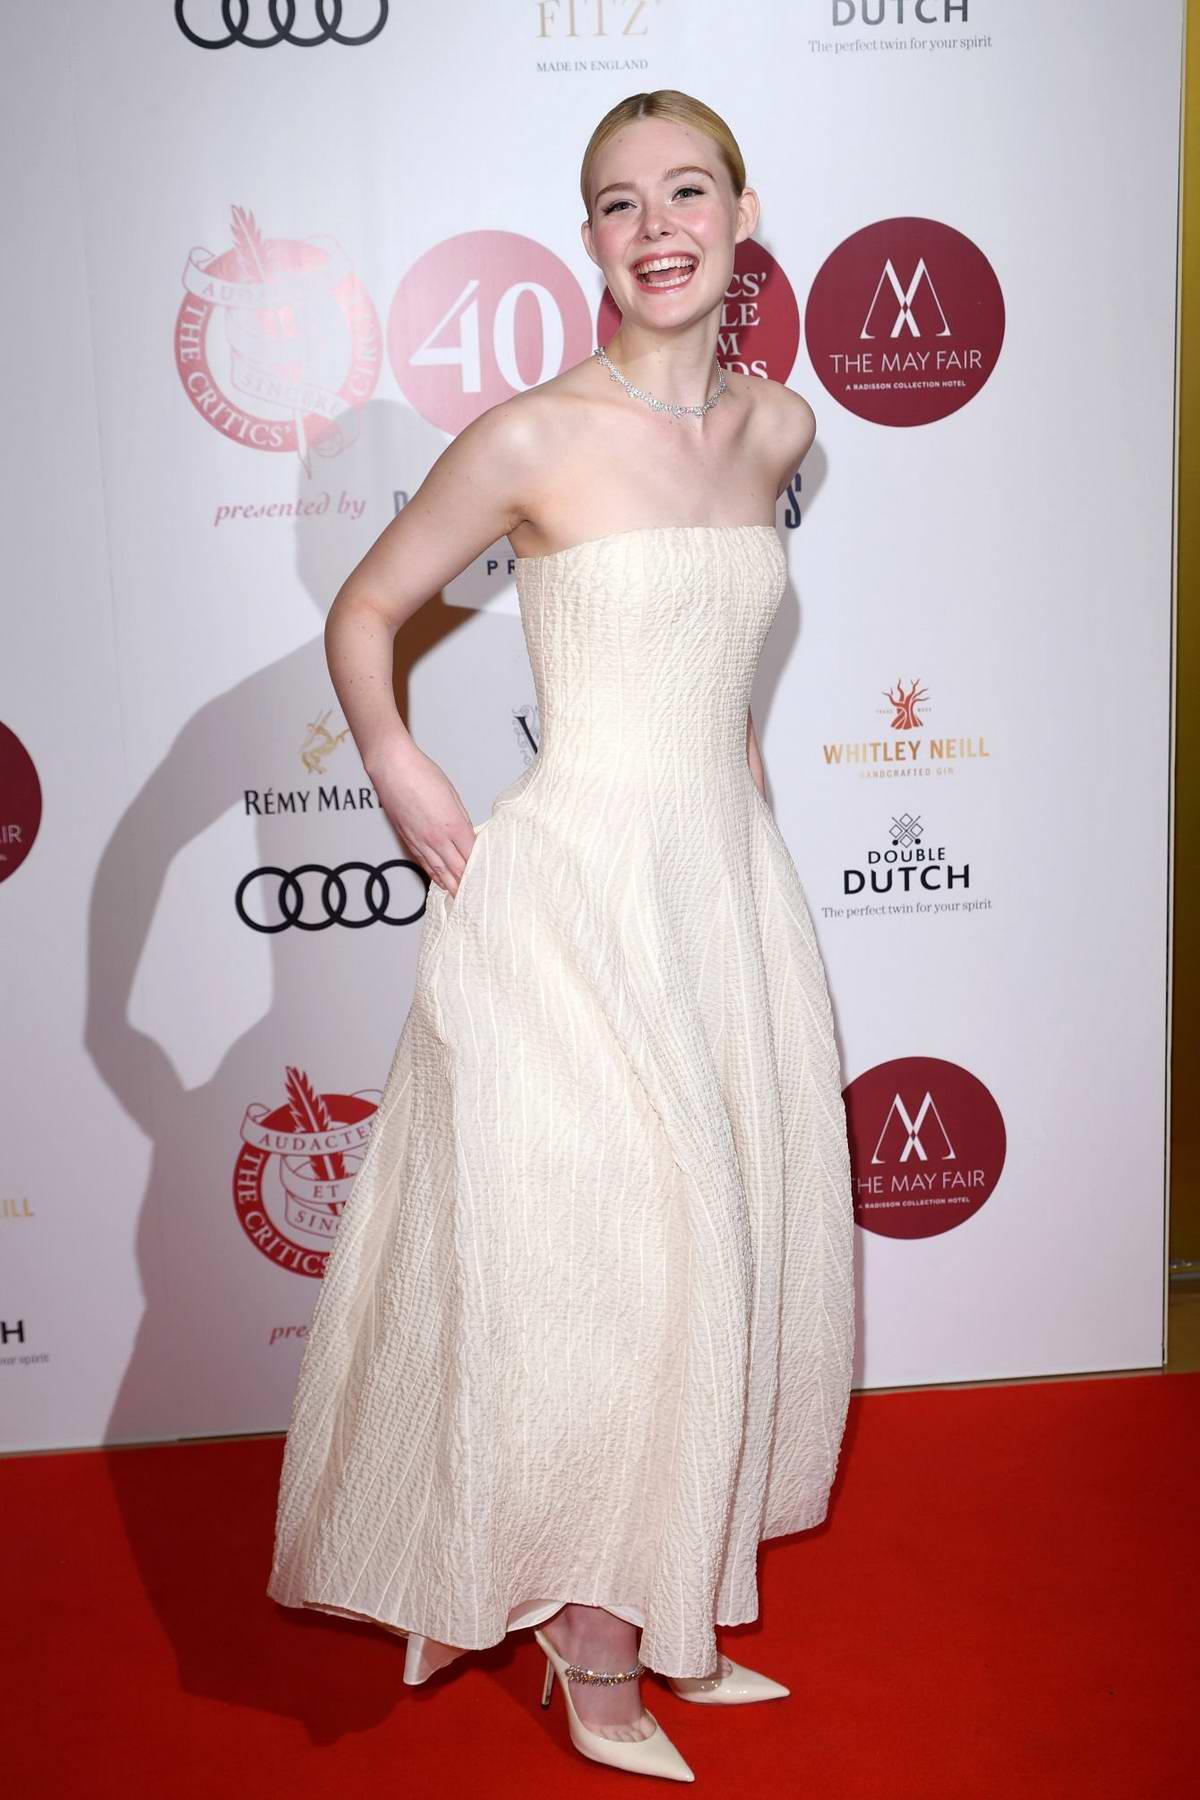 elle-fanning-in-ralph-lauren-collection-the-london-critics-circle-film-awards-2020